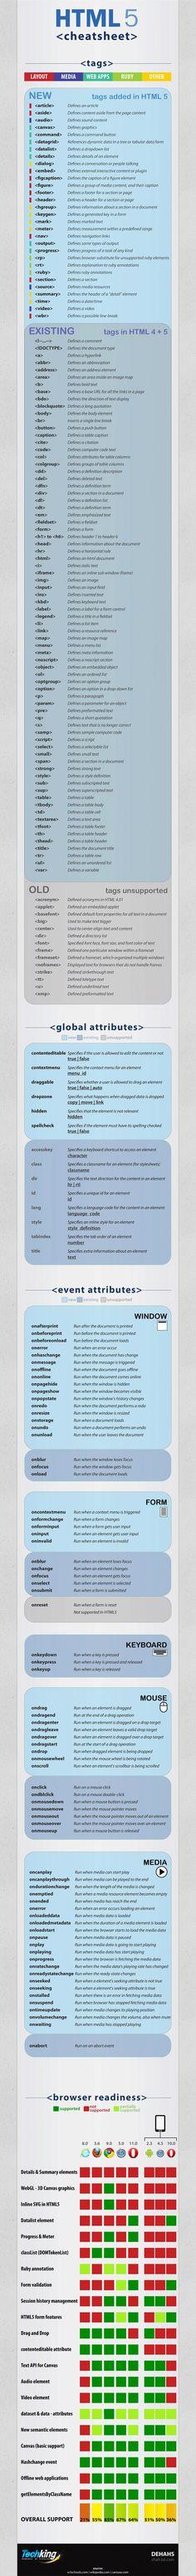 Hypertext Markup Language 5 Cheat sheet | Downgraf - Design Weblog For Designers